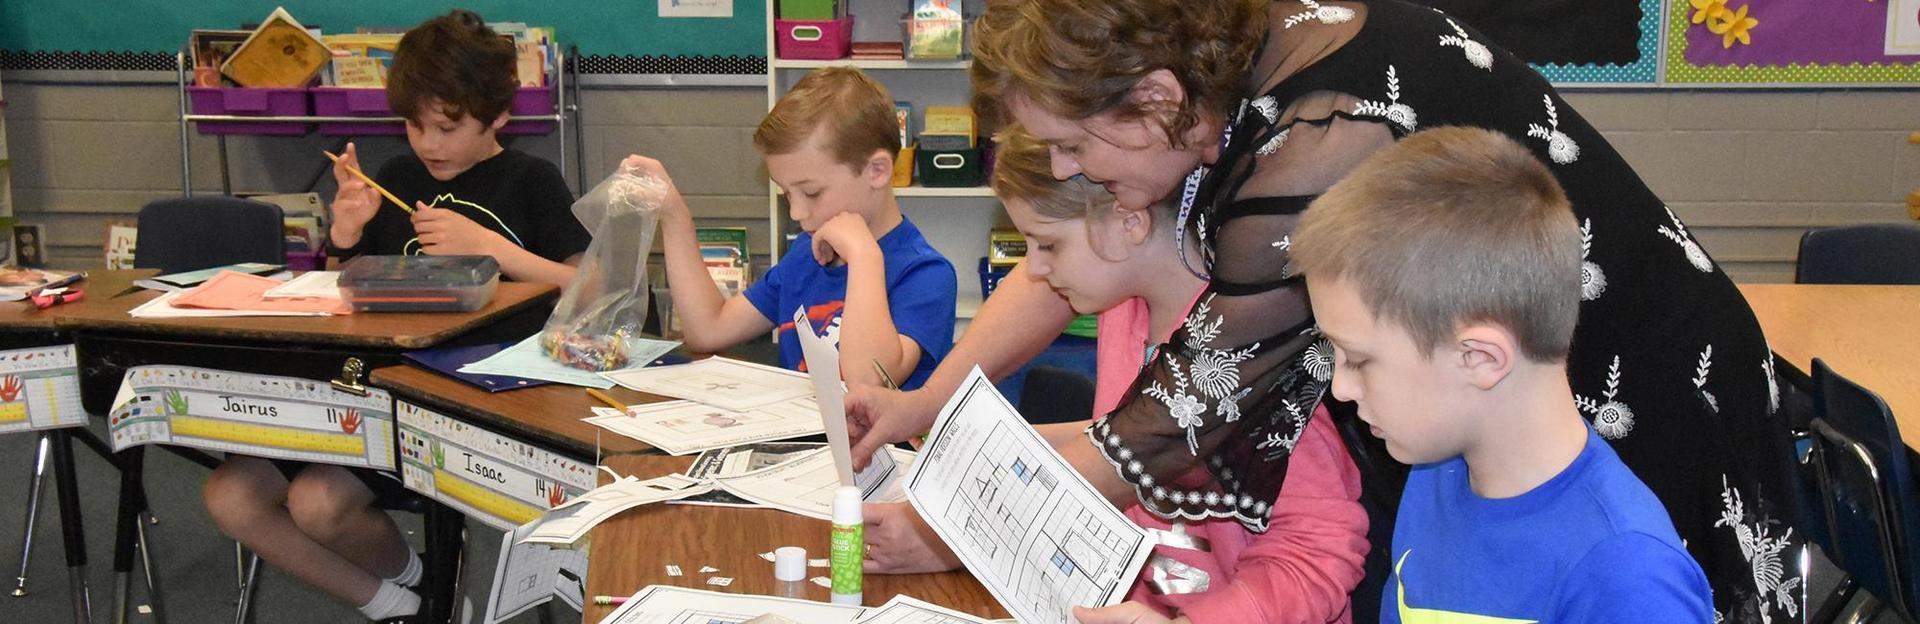 2nd graders in classrooom